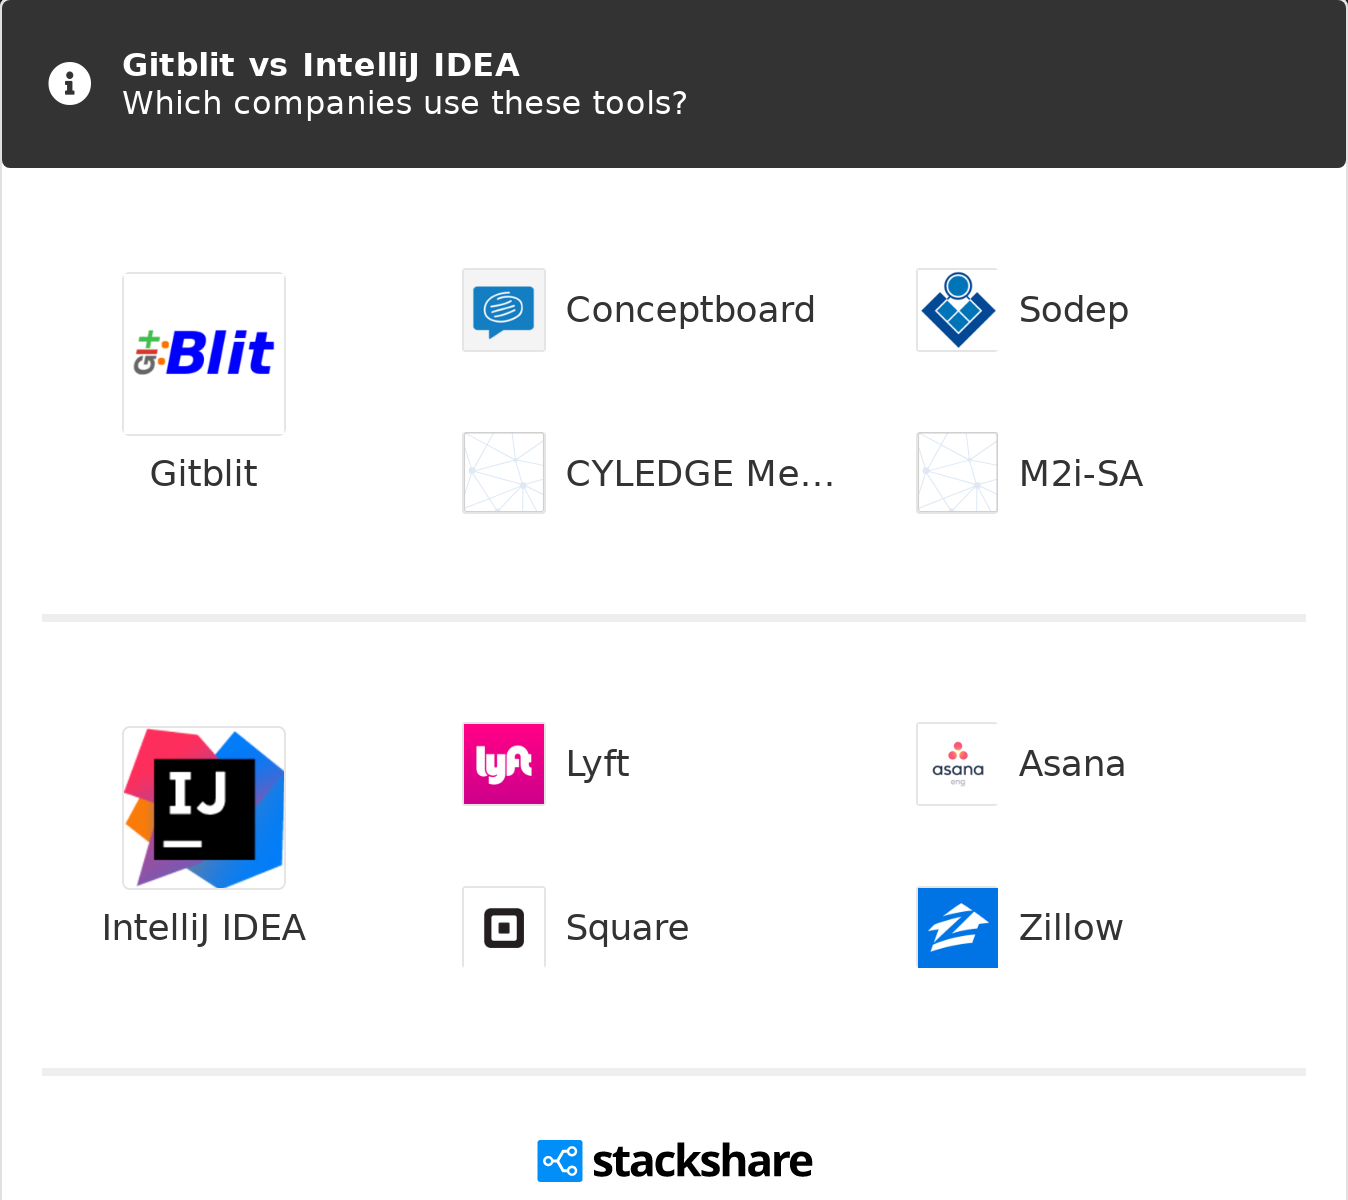 Gitblit vs IntelliJ IDEA | What are the differences?